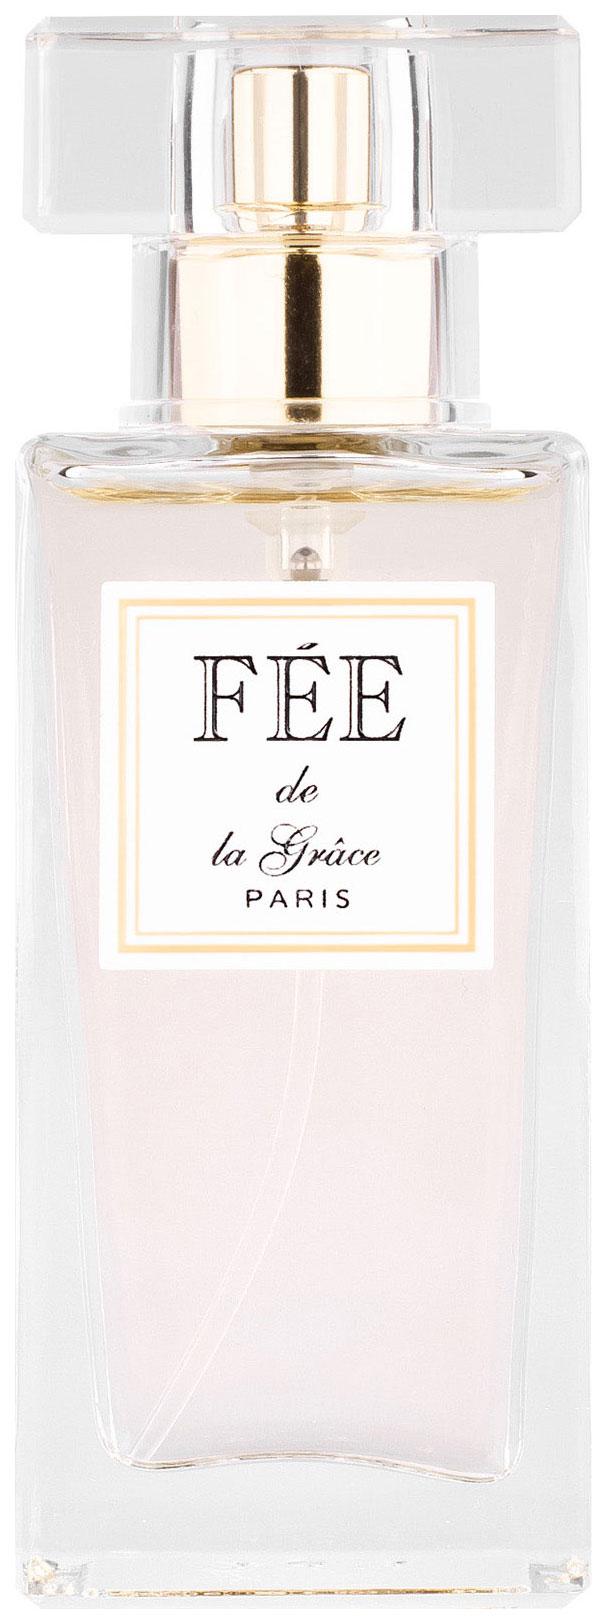 Парфюмерная вода Fee Fée de la Grâce